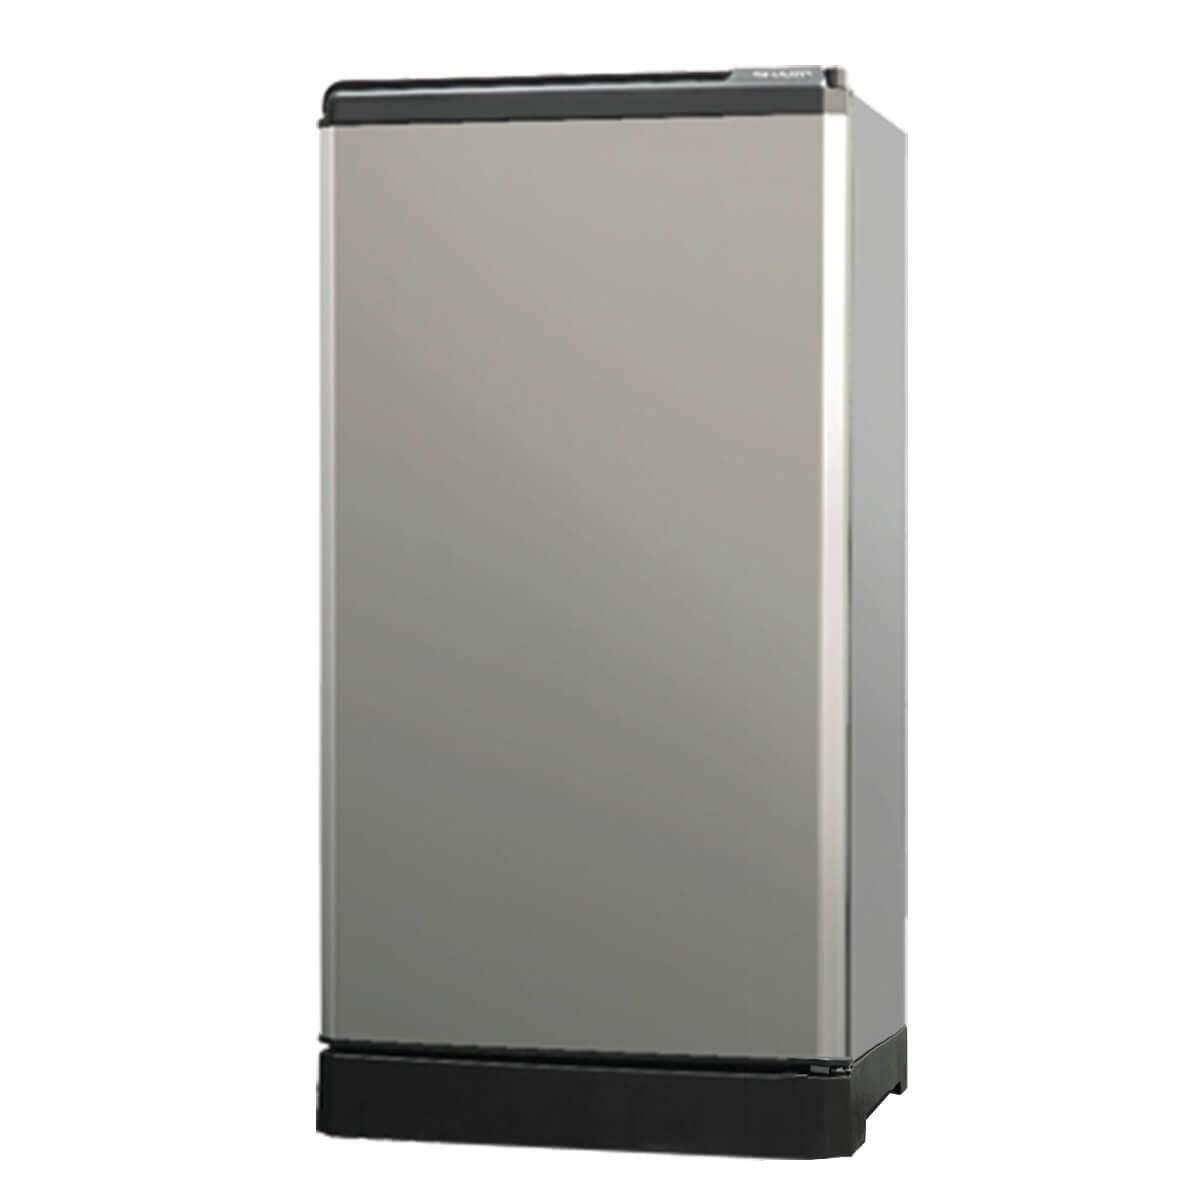 SHARP ตู้เย็น 1 ประตู 6.5 คิว รุ่น SJ-G19S-SL